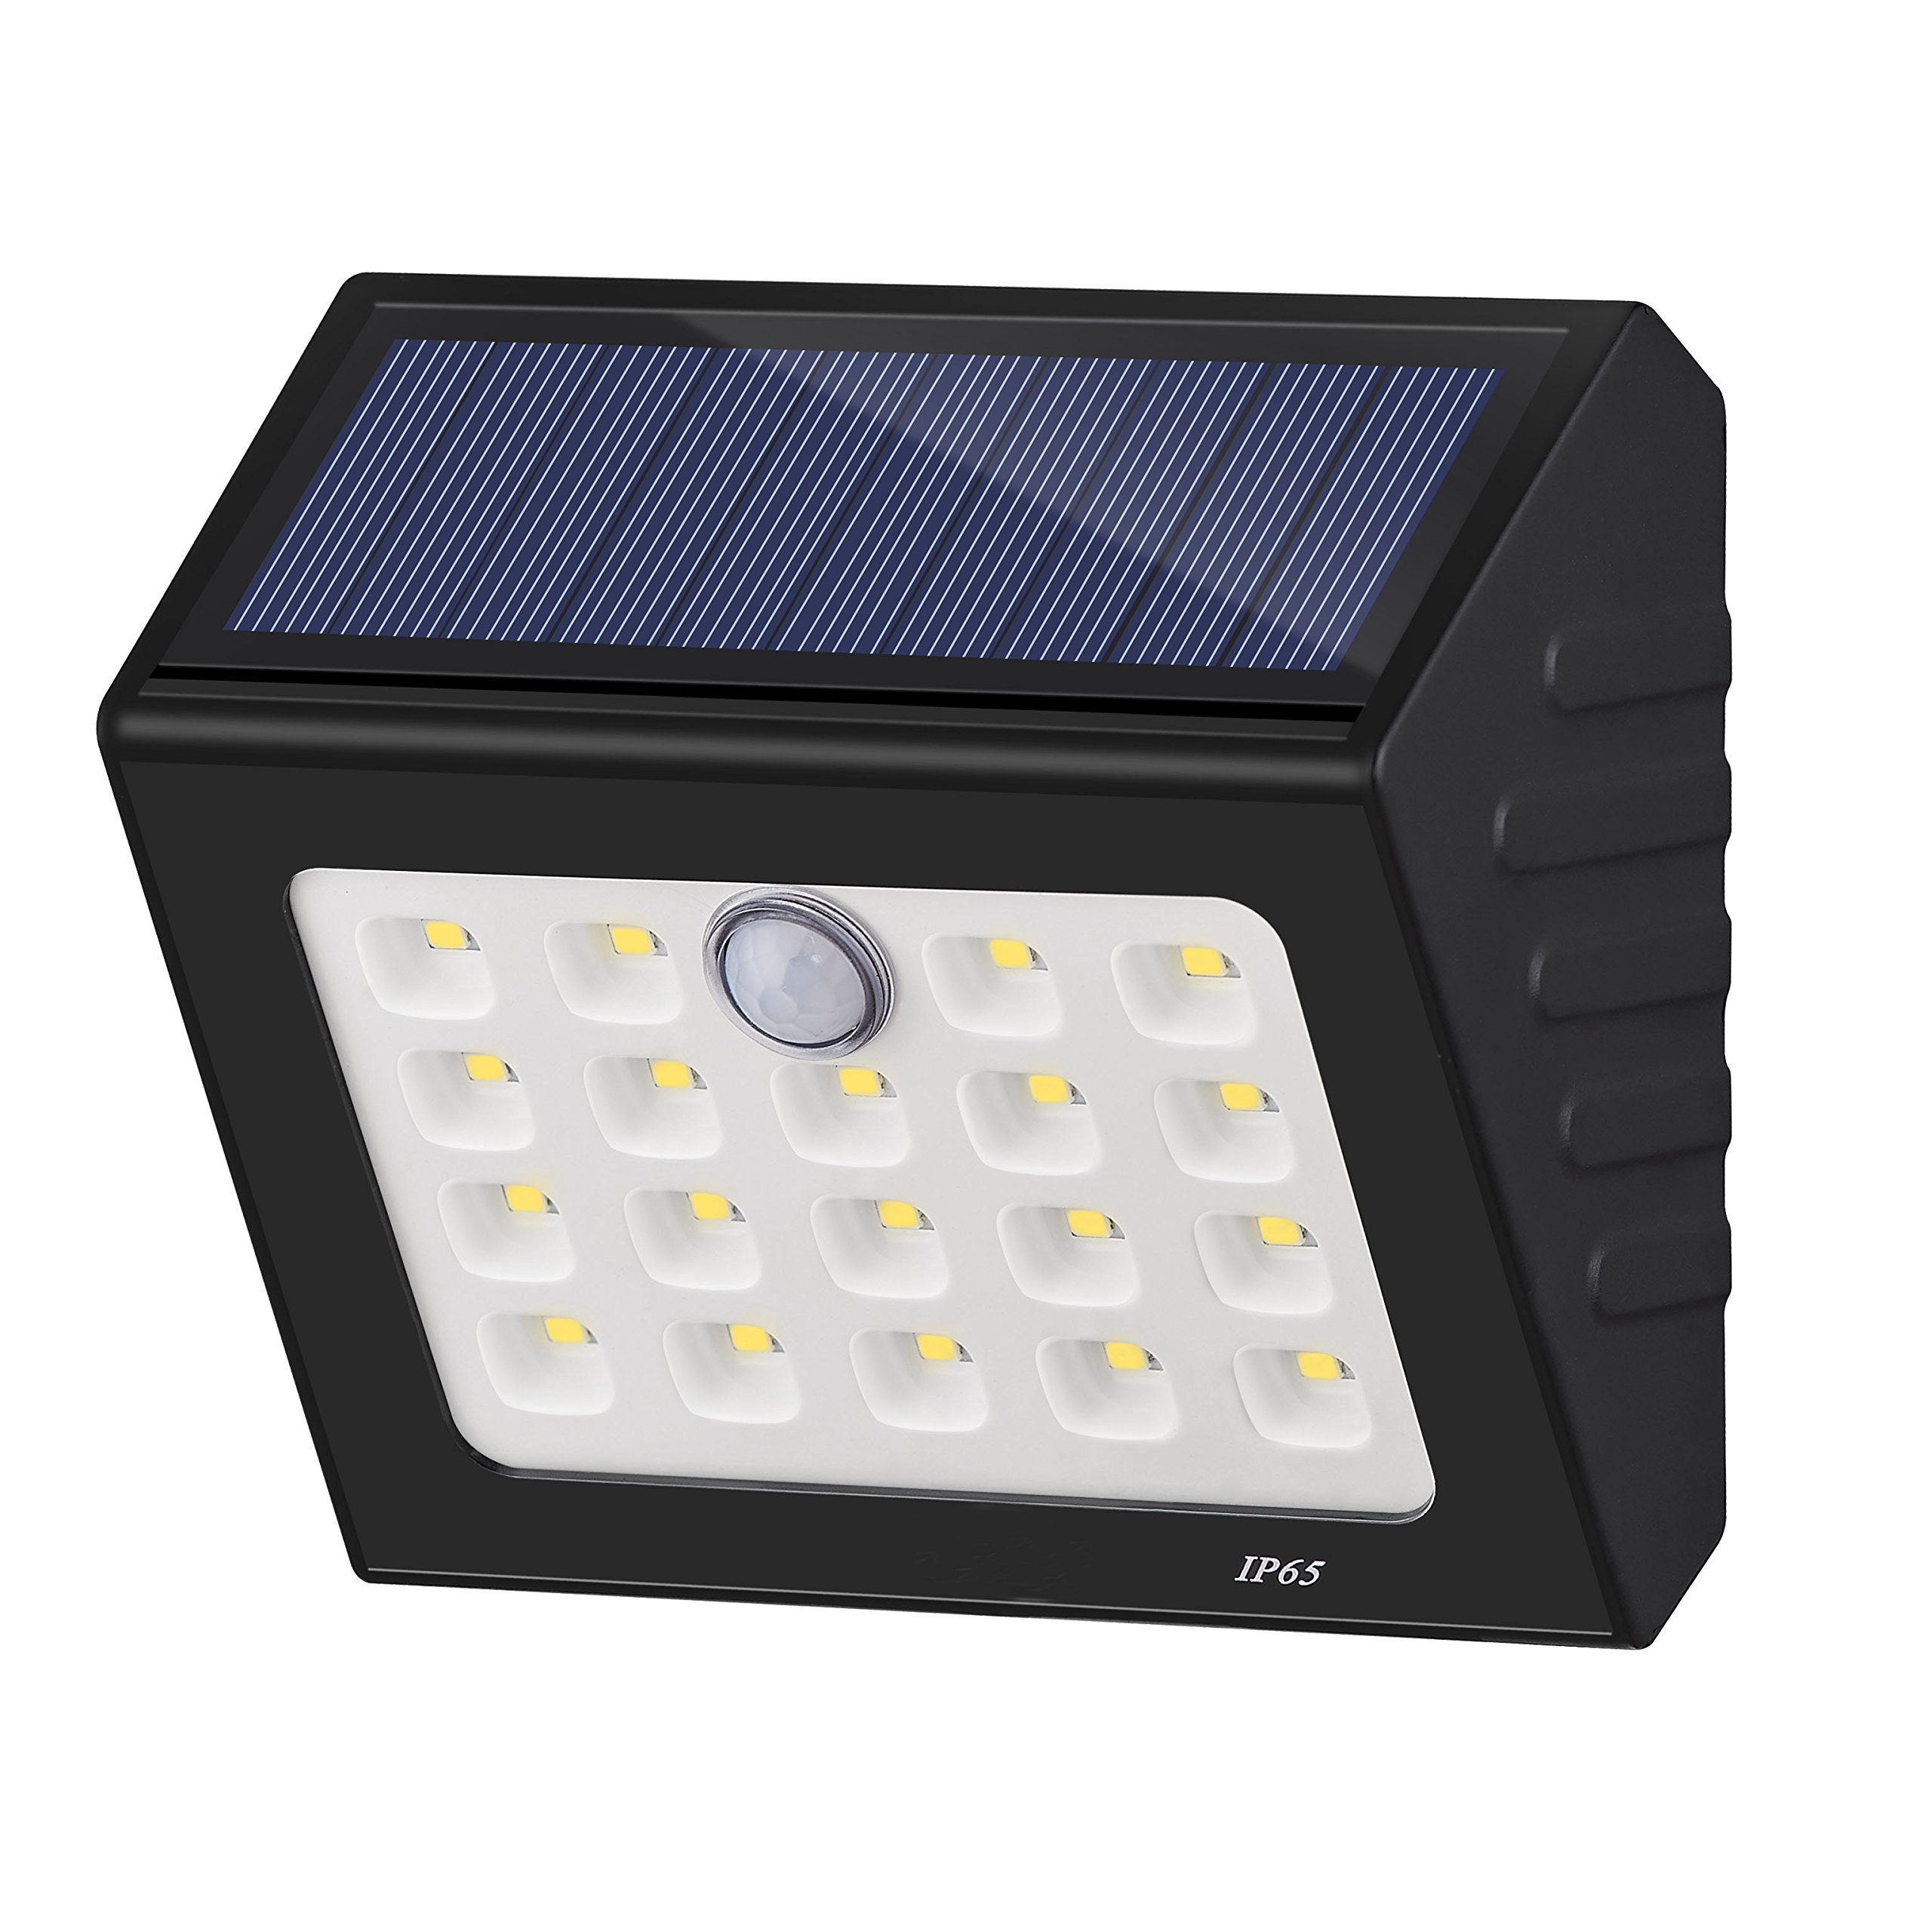 Solar Motion Sensor Light , 19 LED Wall Light Solar Powered Garden Light, Waterproof Wireless Security Lights for Step,Fence,Gate,Yard or Driverway (ON/OFF Mode) (Black)